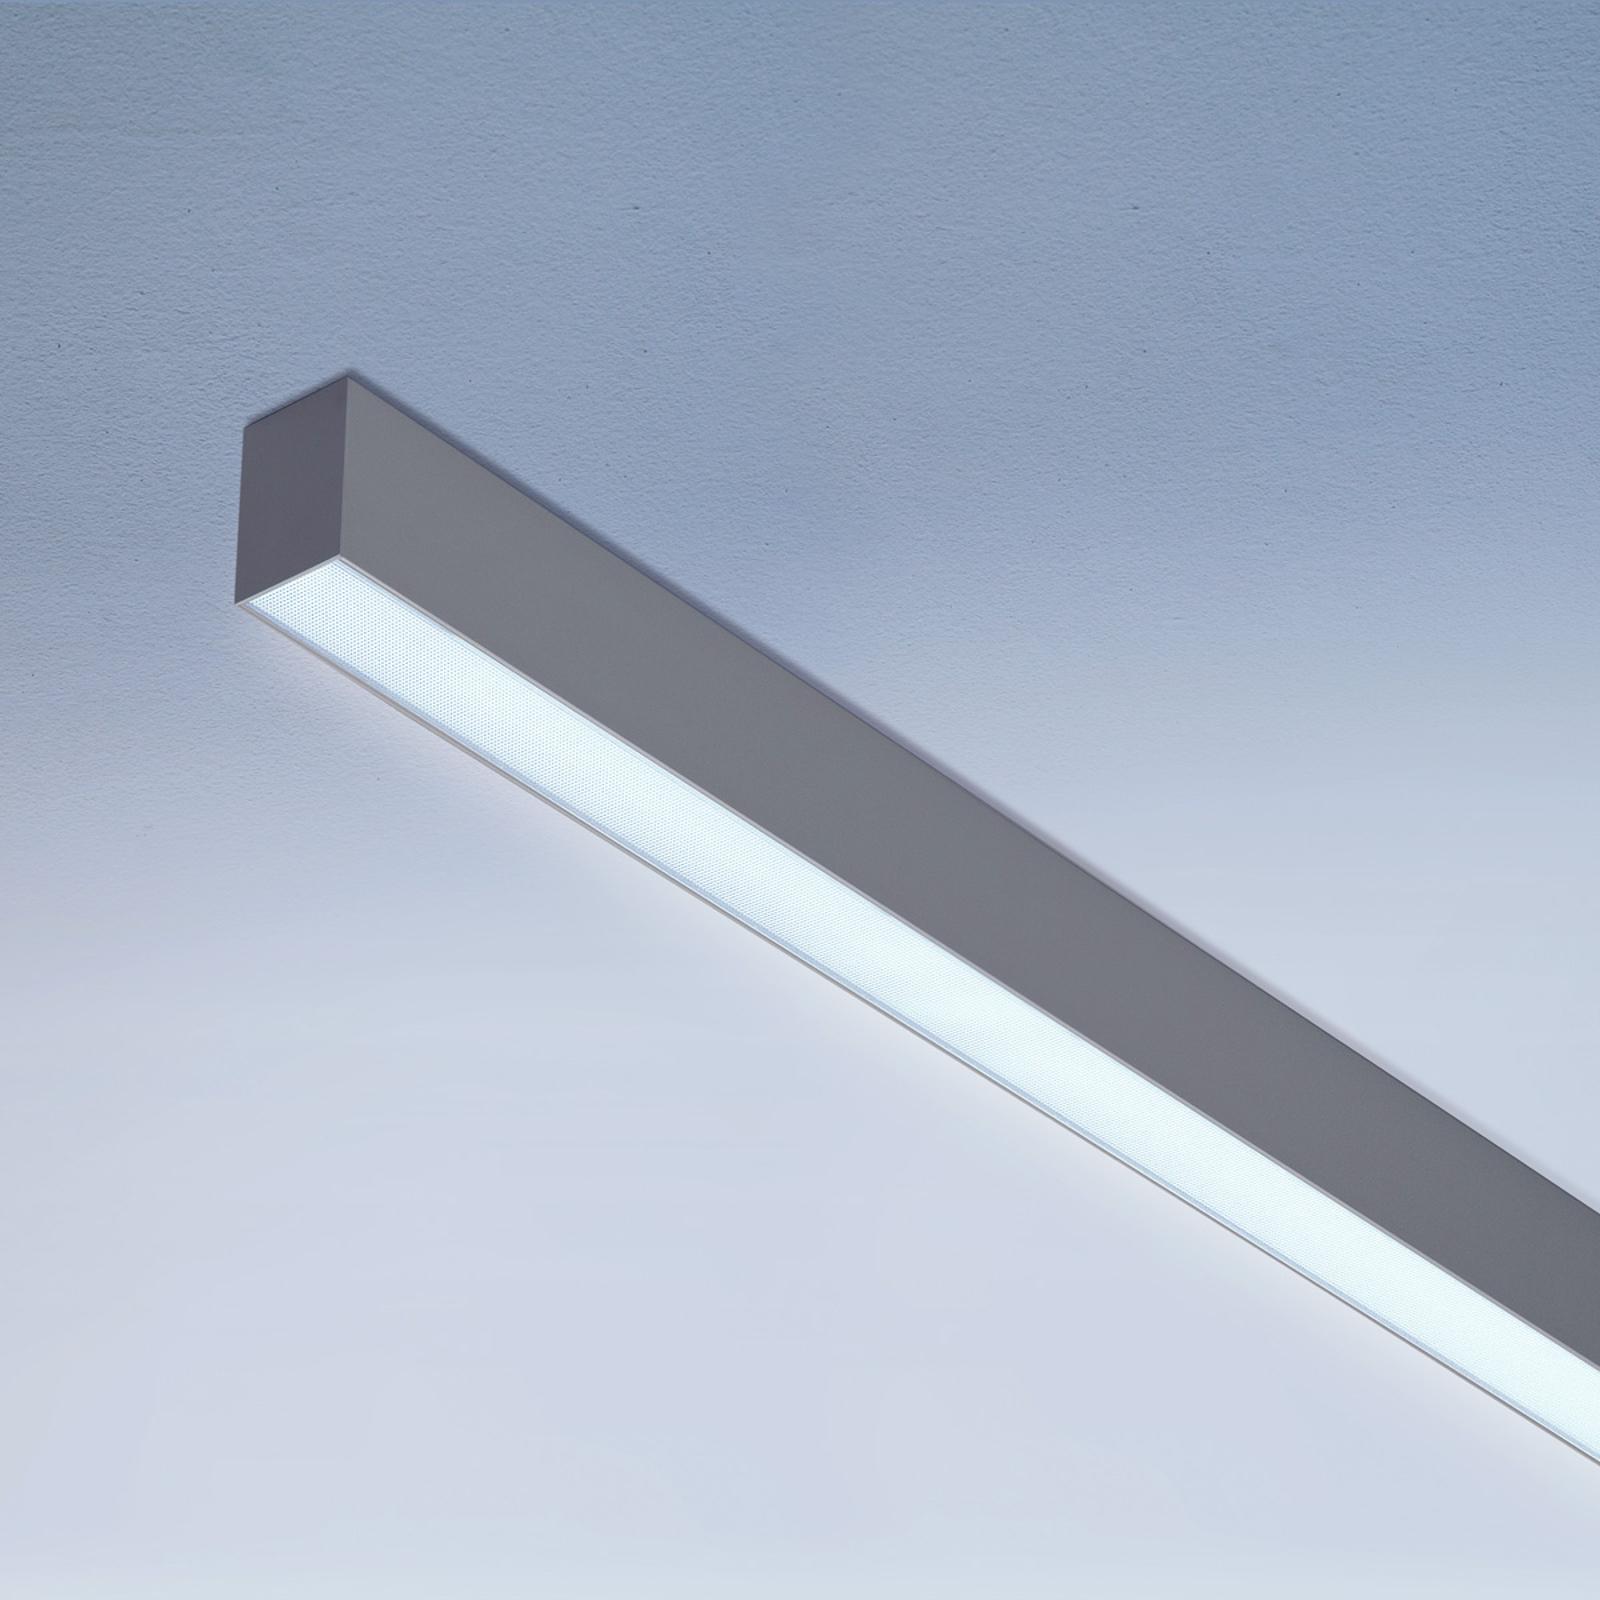 Medium Power - LED-Wandleuchte Matric-A3 89 cm 24